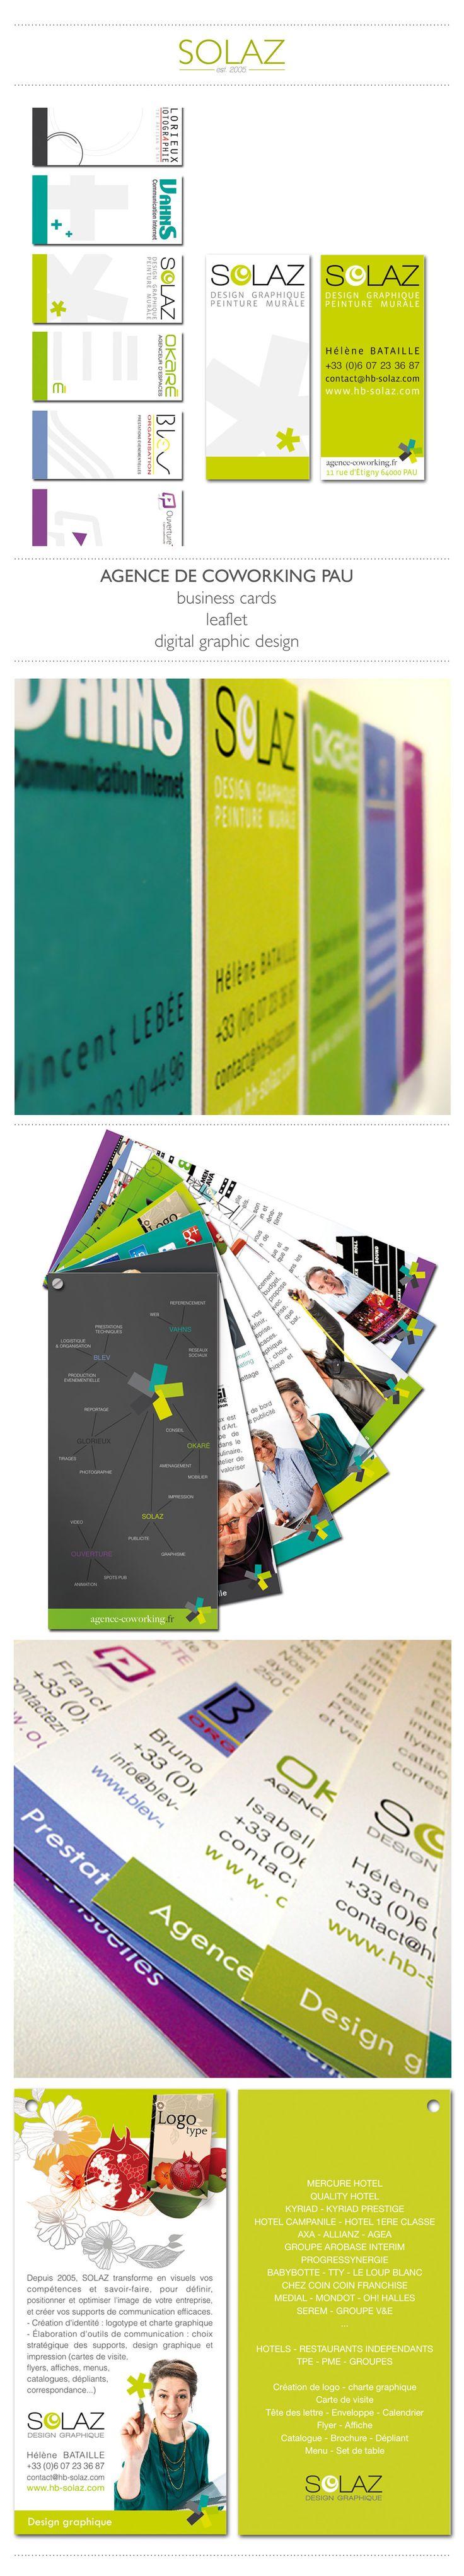 AGENCE DE COWORKING - on Behance - #logo #brandidentity #businesscard #catalogue #leaflets #pantone #chart #team #communication #collection #series #colors